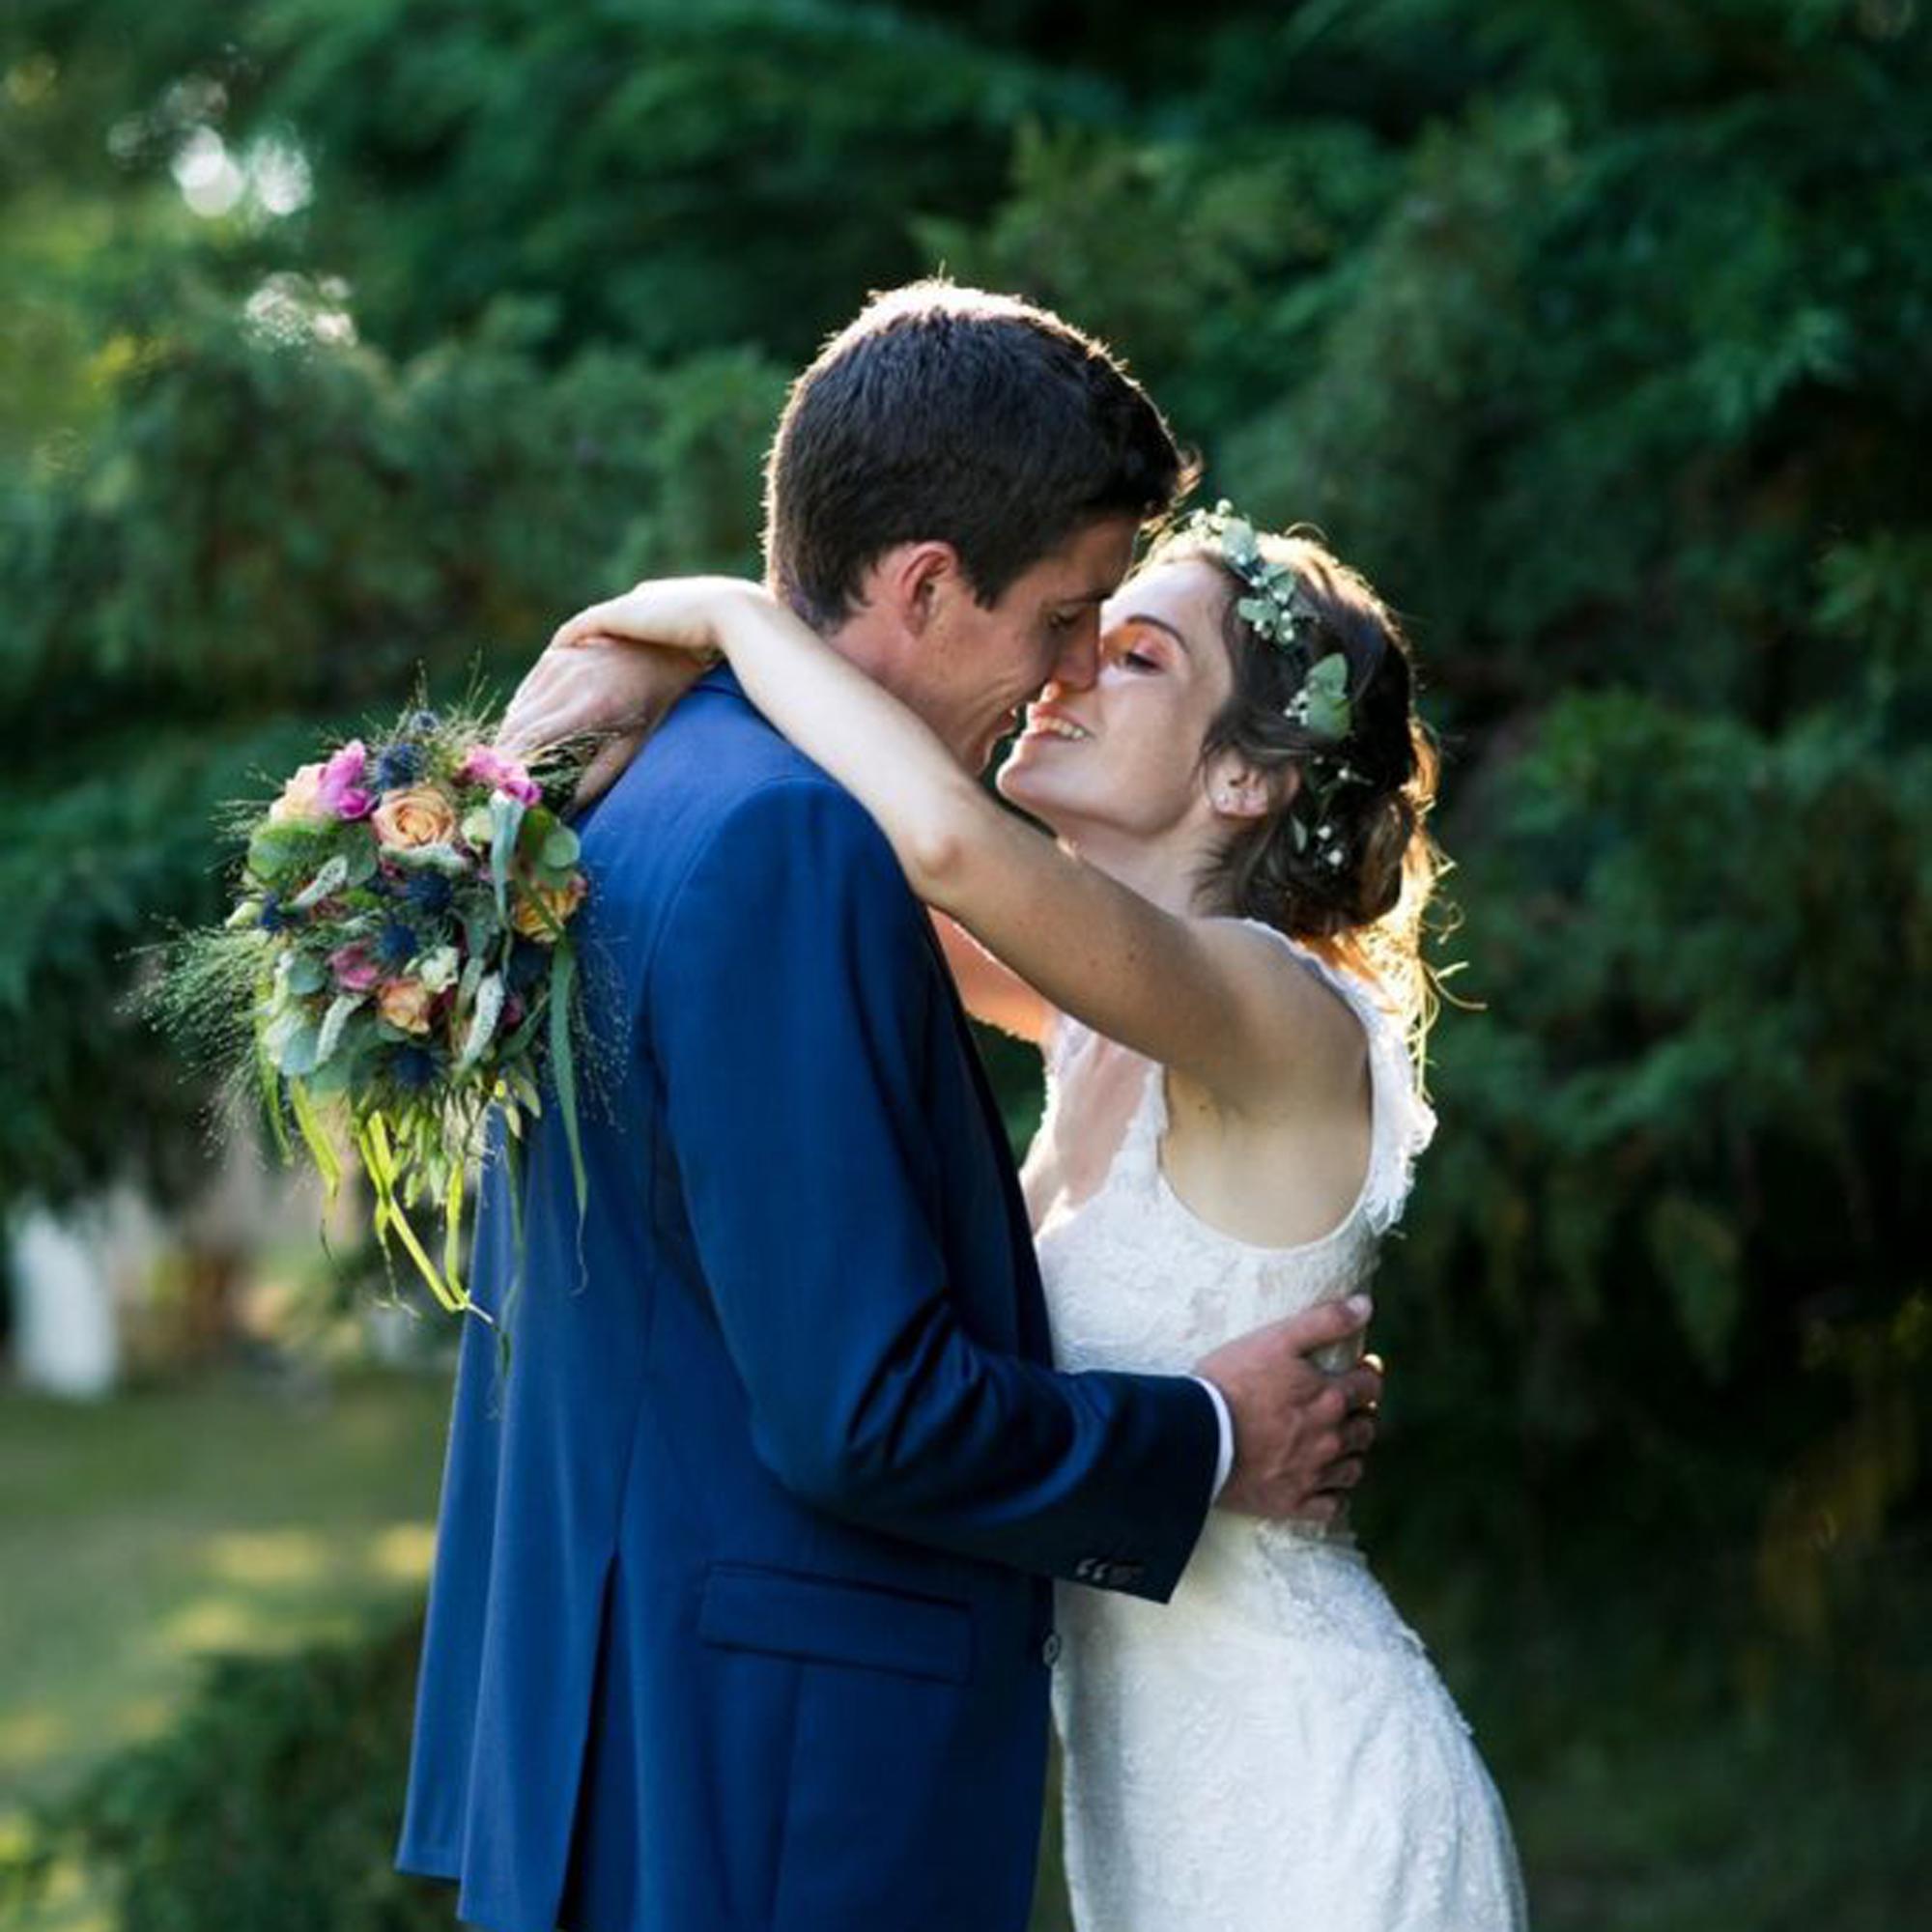 lauren-kim-minn-photographe-mariage-nantes